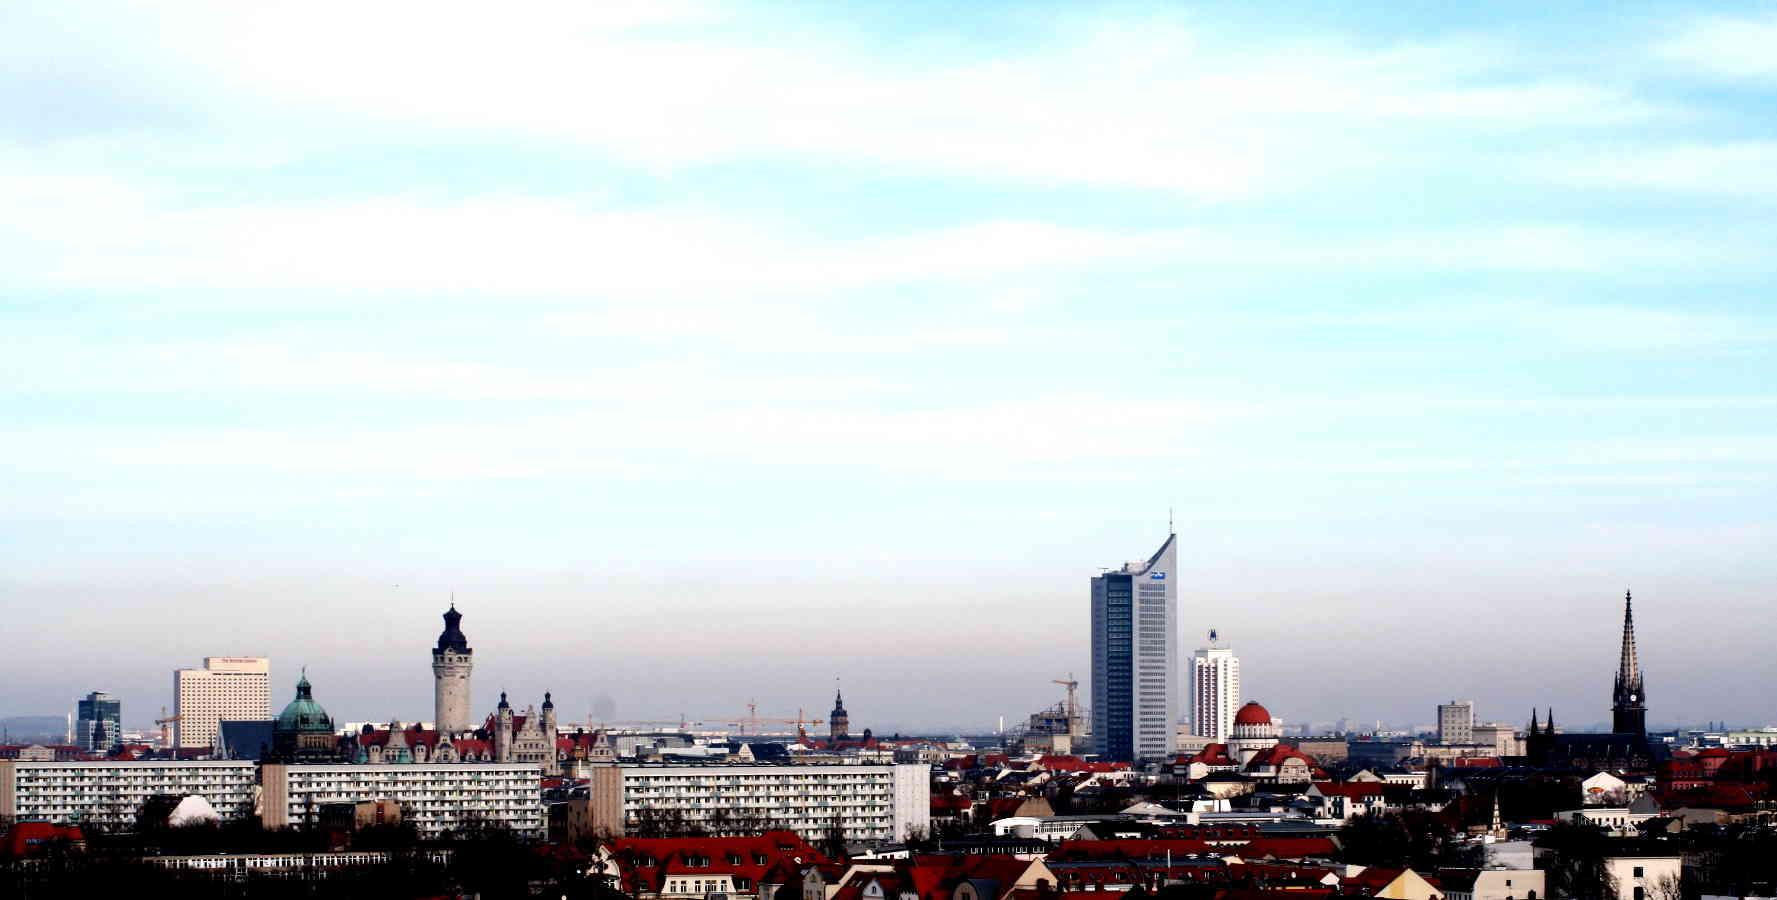 Leipzig Biketours - Leipzig Panorama vom Fokeberg. Neues Rathaus und Uni Riese